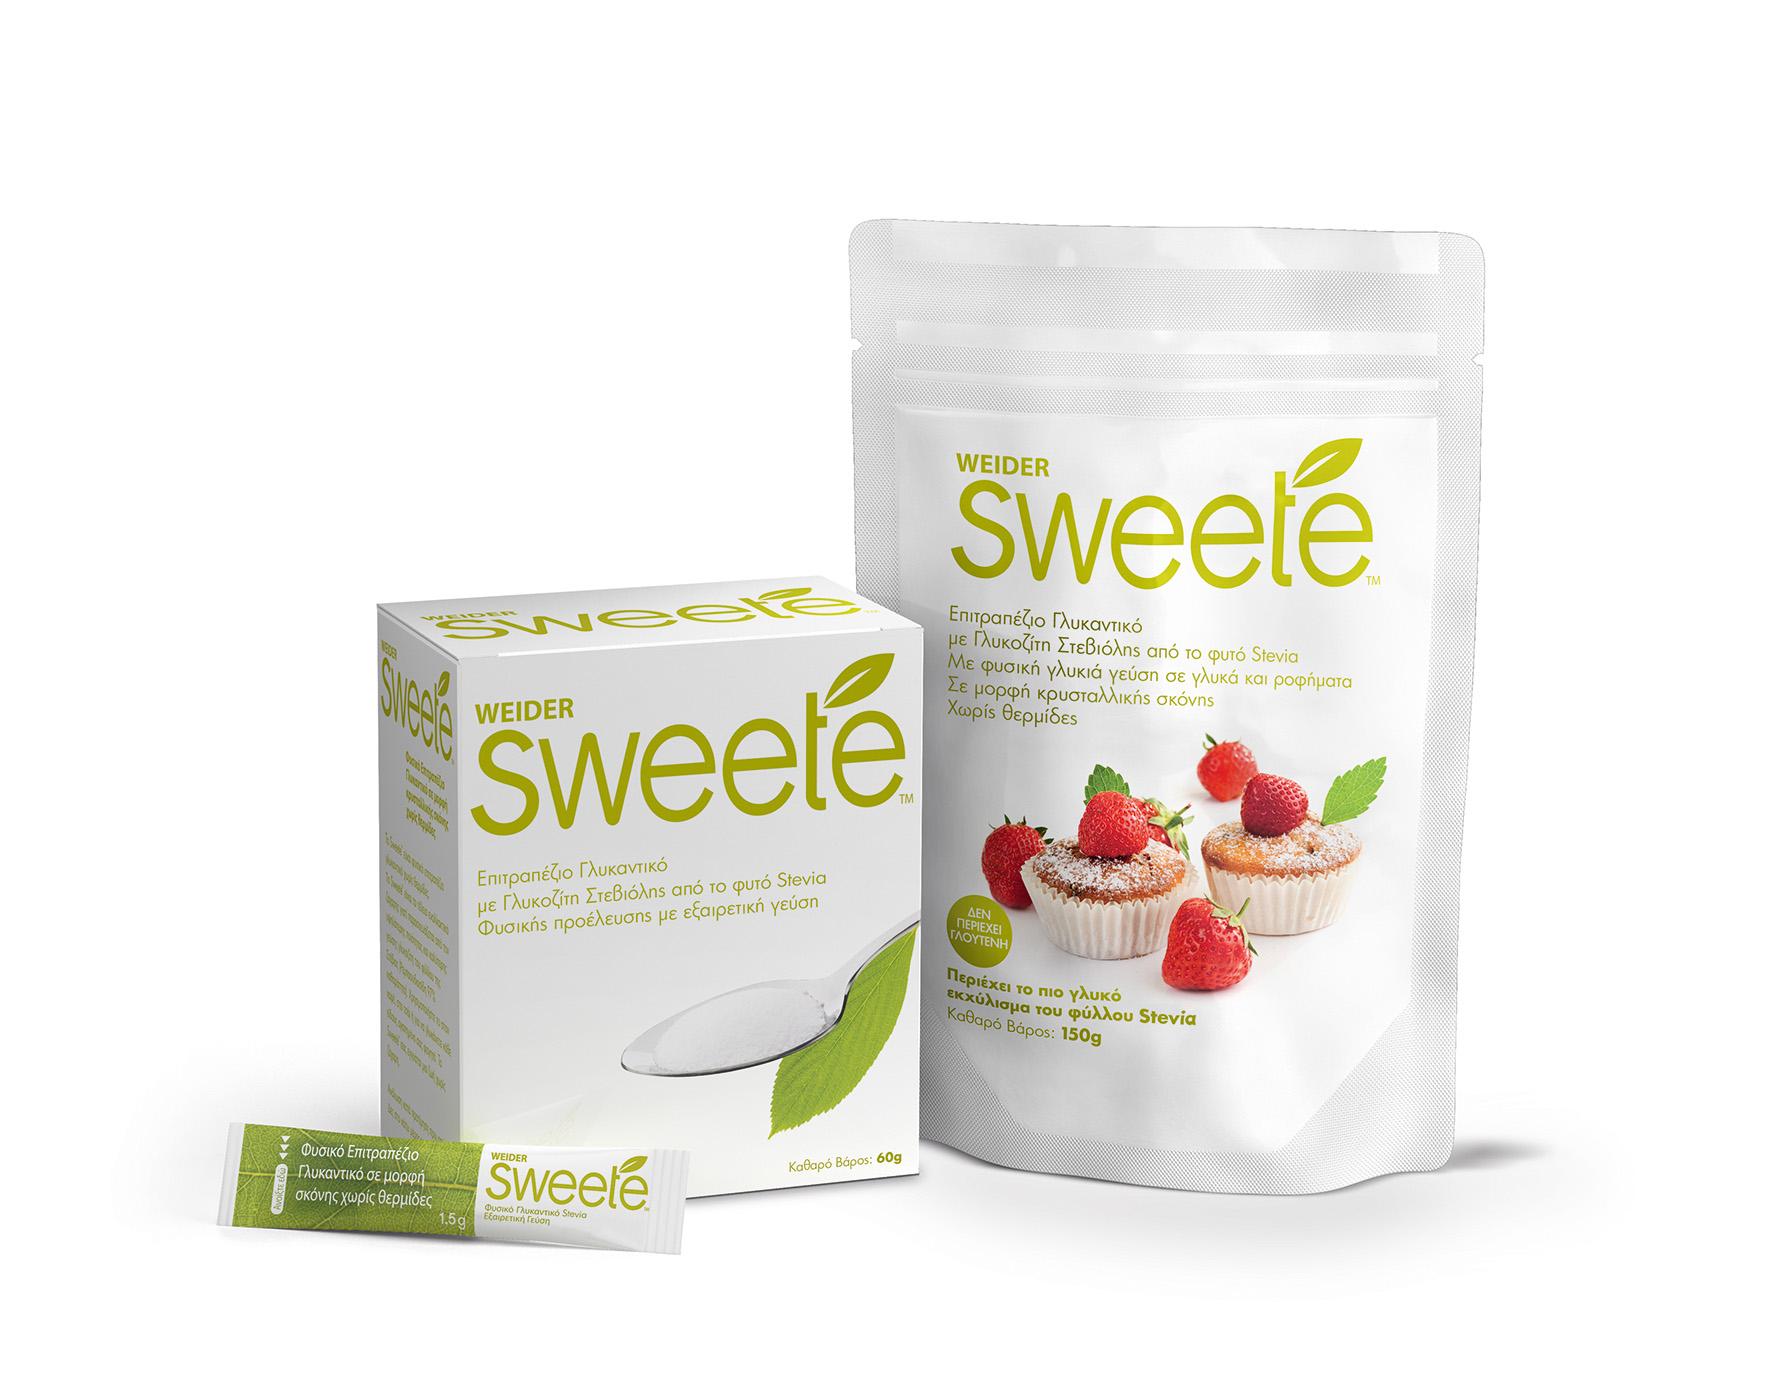 Sweete γλυκαντικό από Στέβια - Διαβητικό χωριό 2013